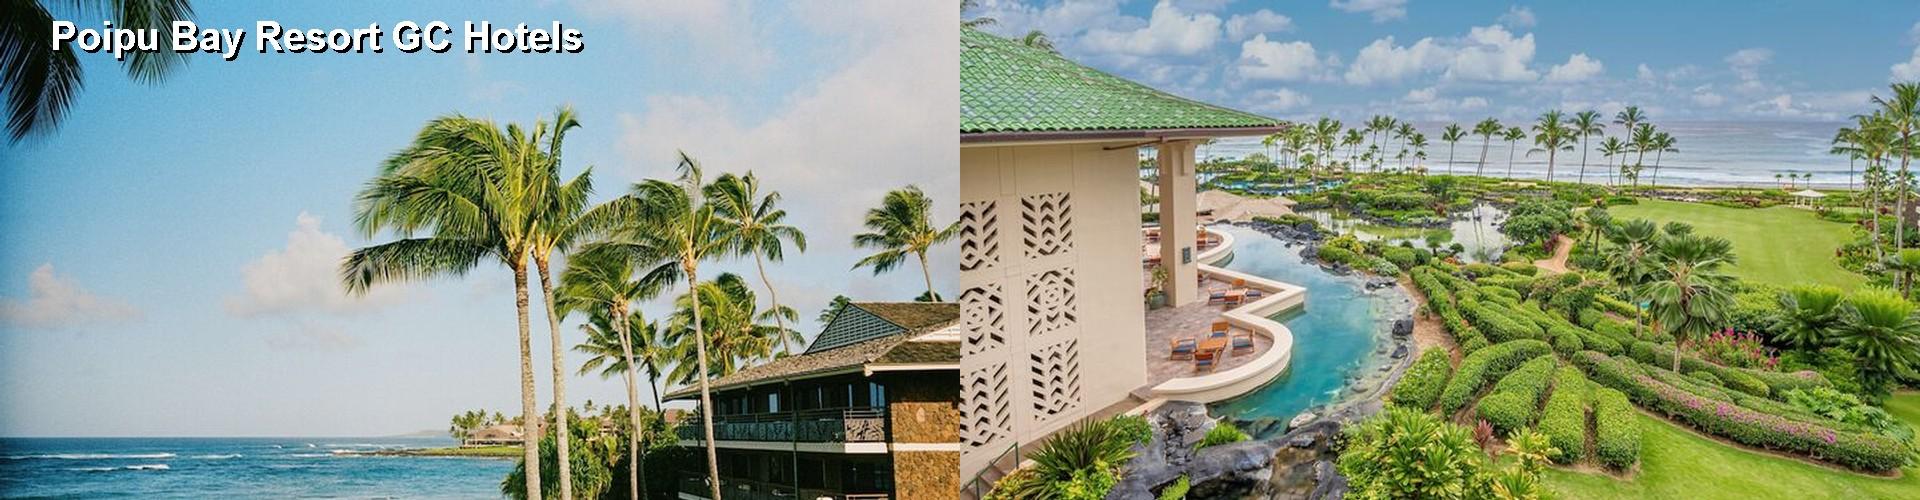 5 Best Hotels Near Poipu Bay Resort Gc